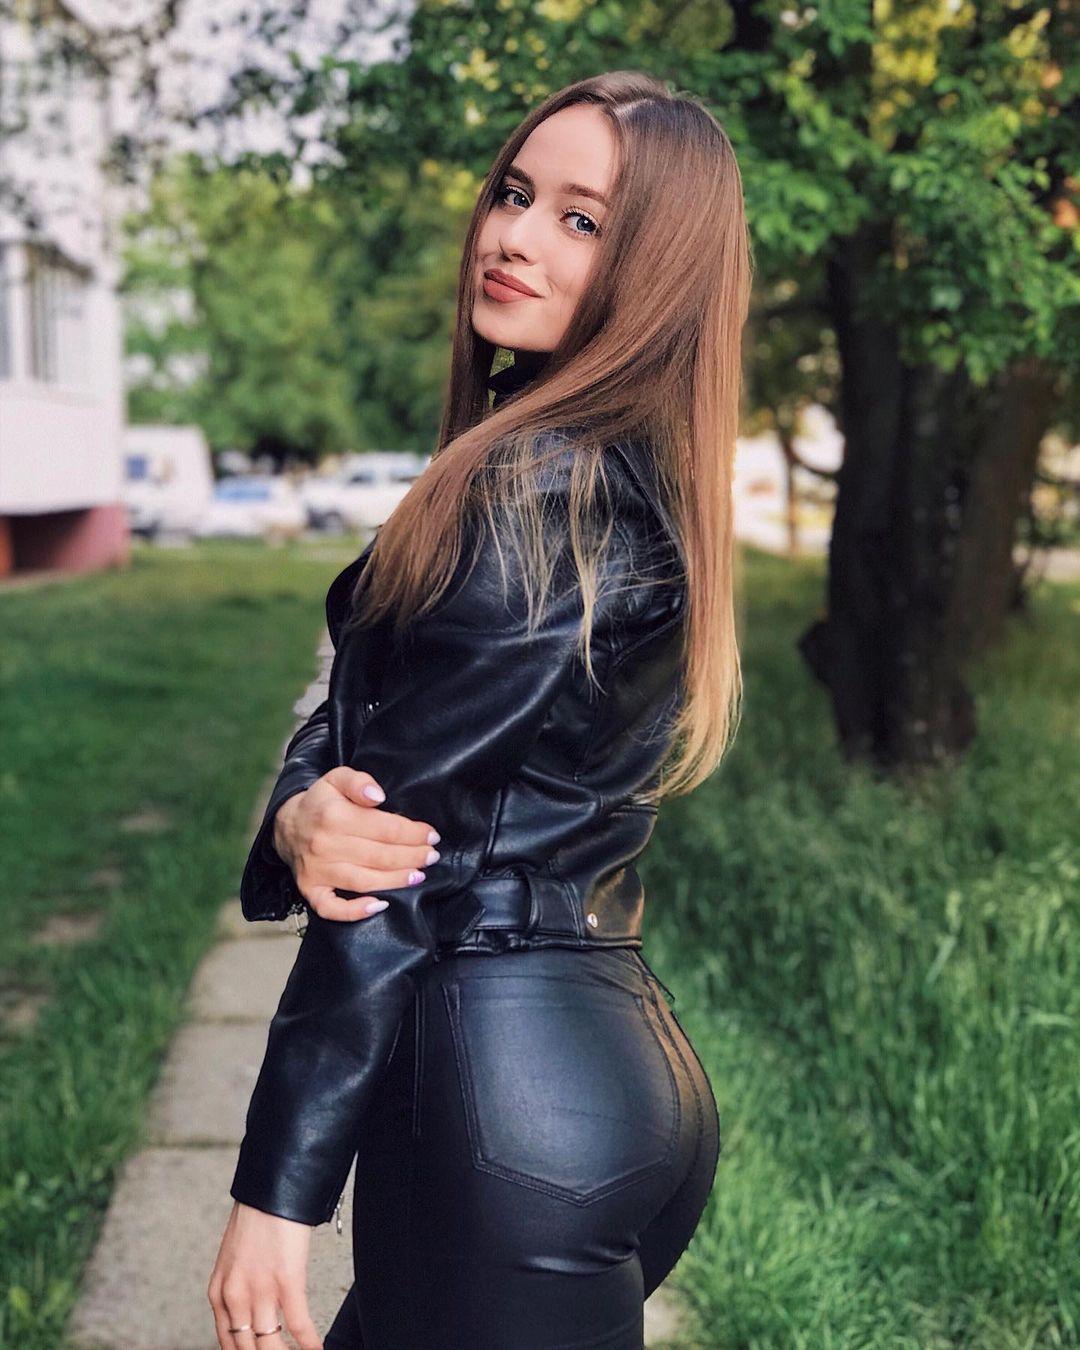 hot ukraine girl